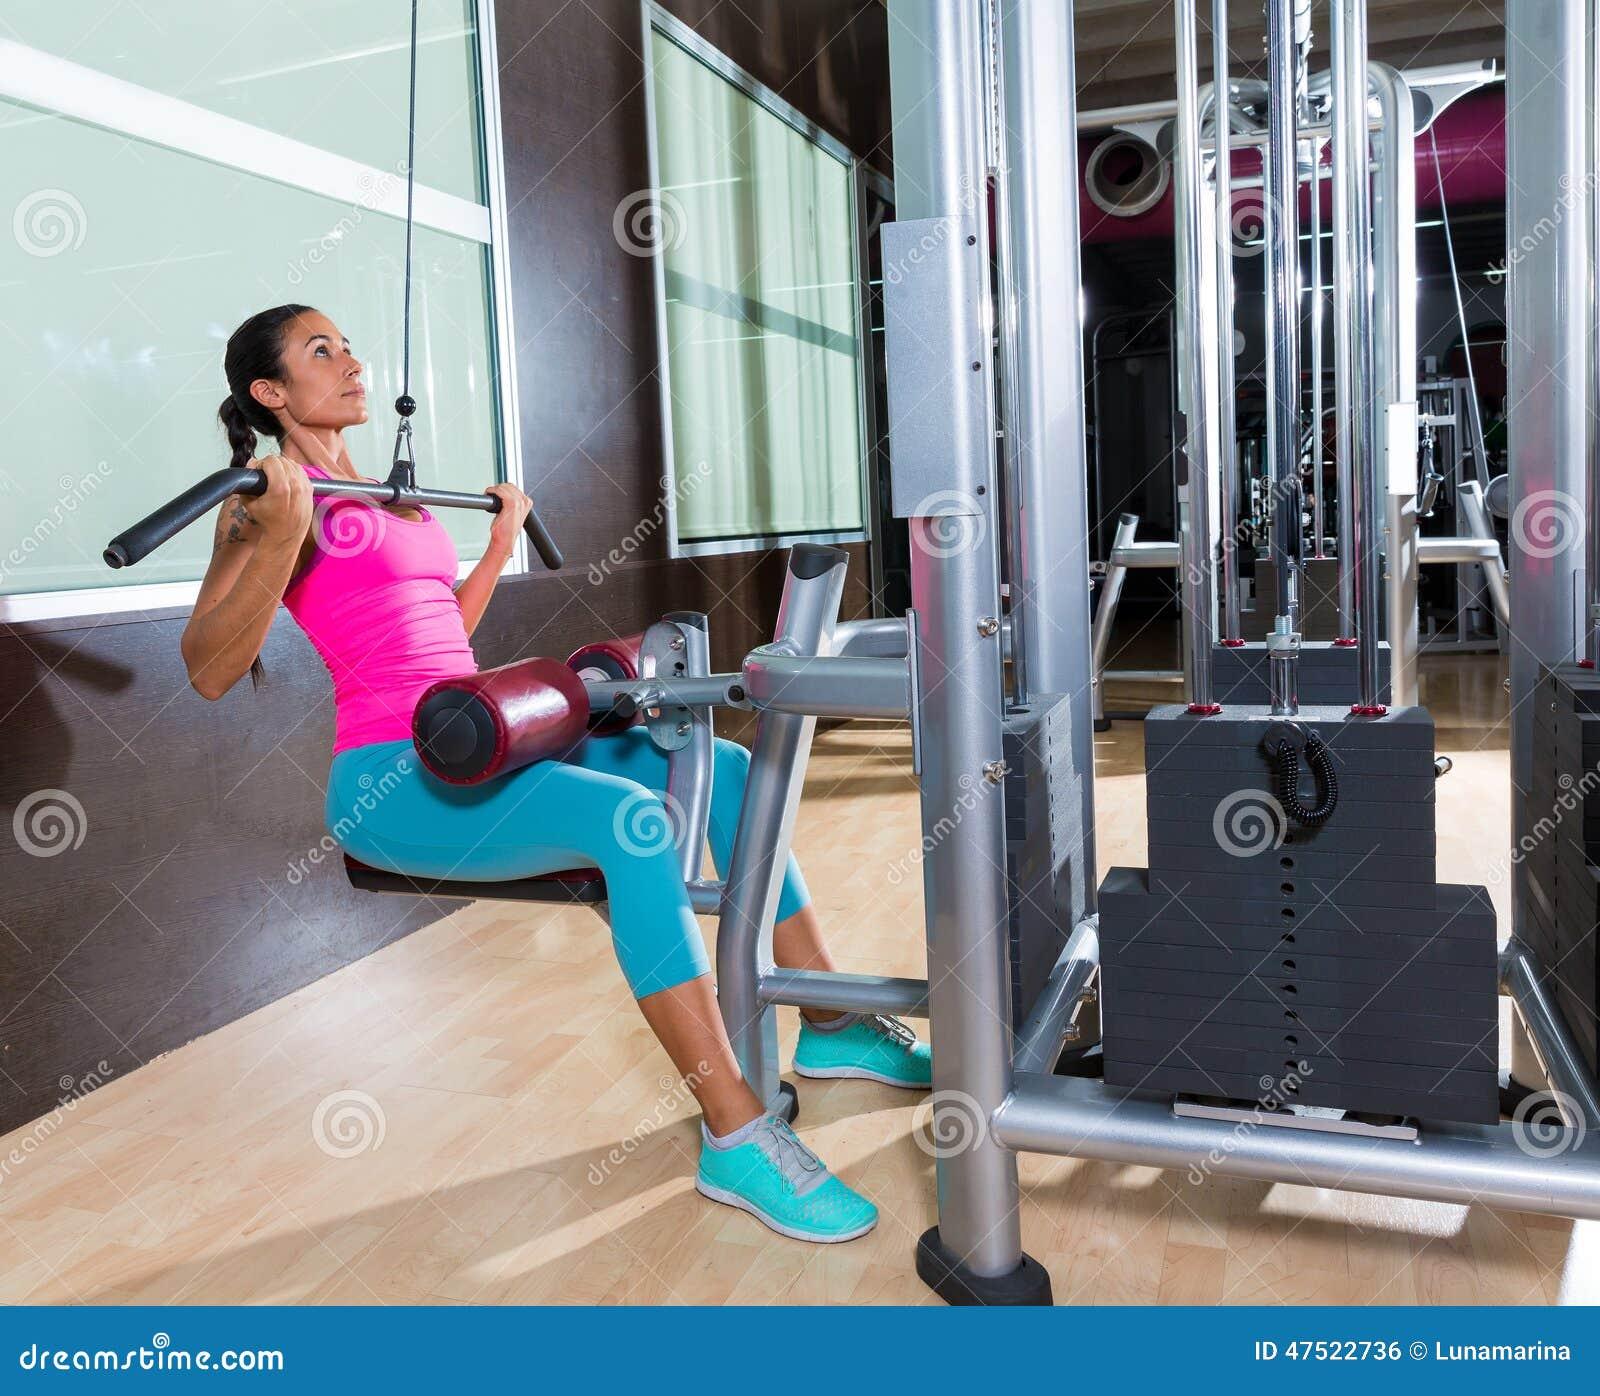 Lat Pulldown Machine Woman Workout At Gym Stock Photo